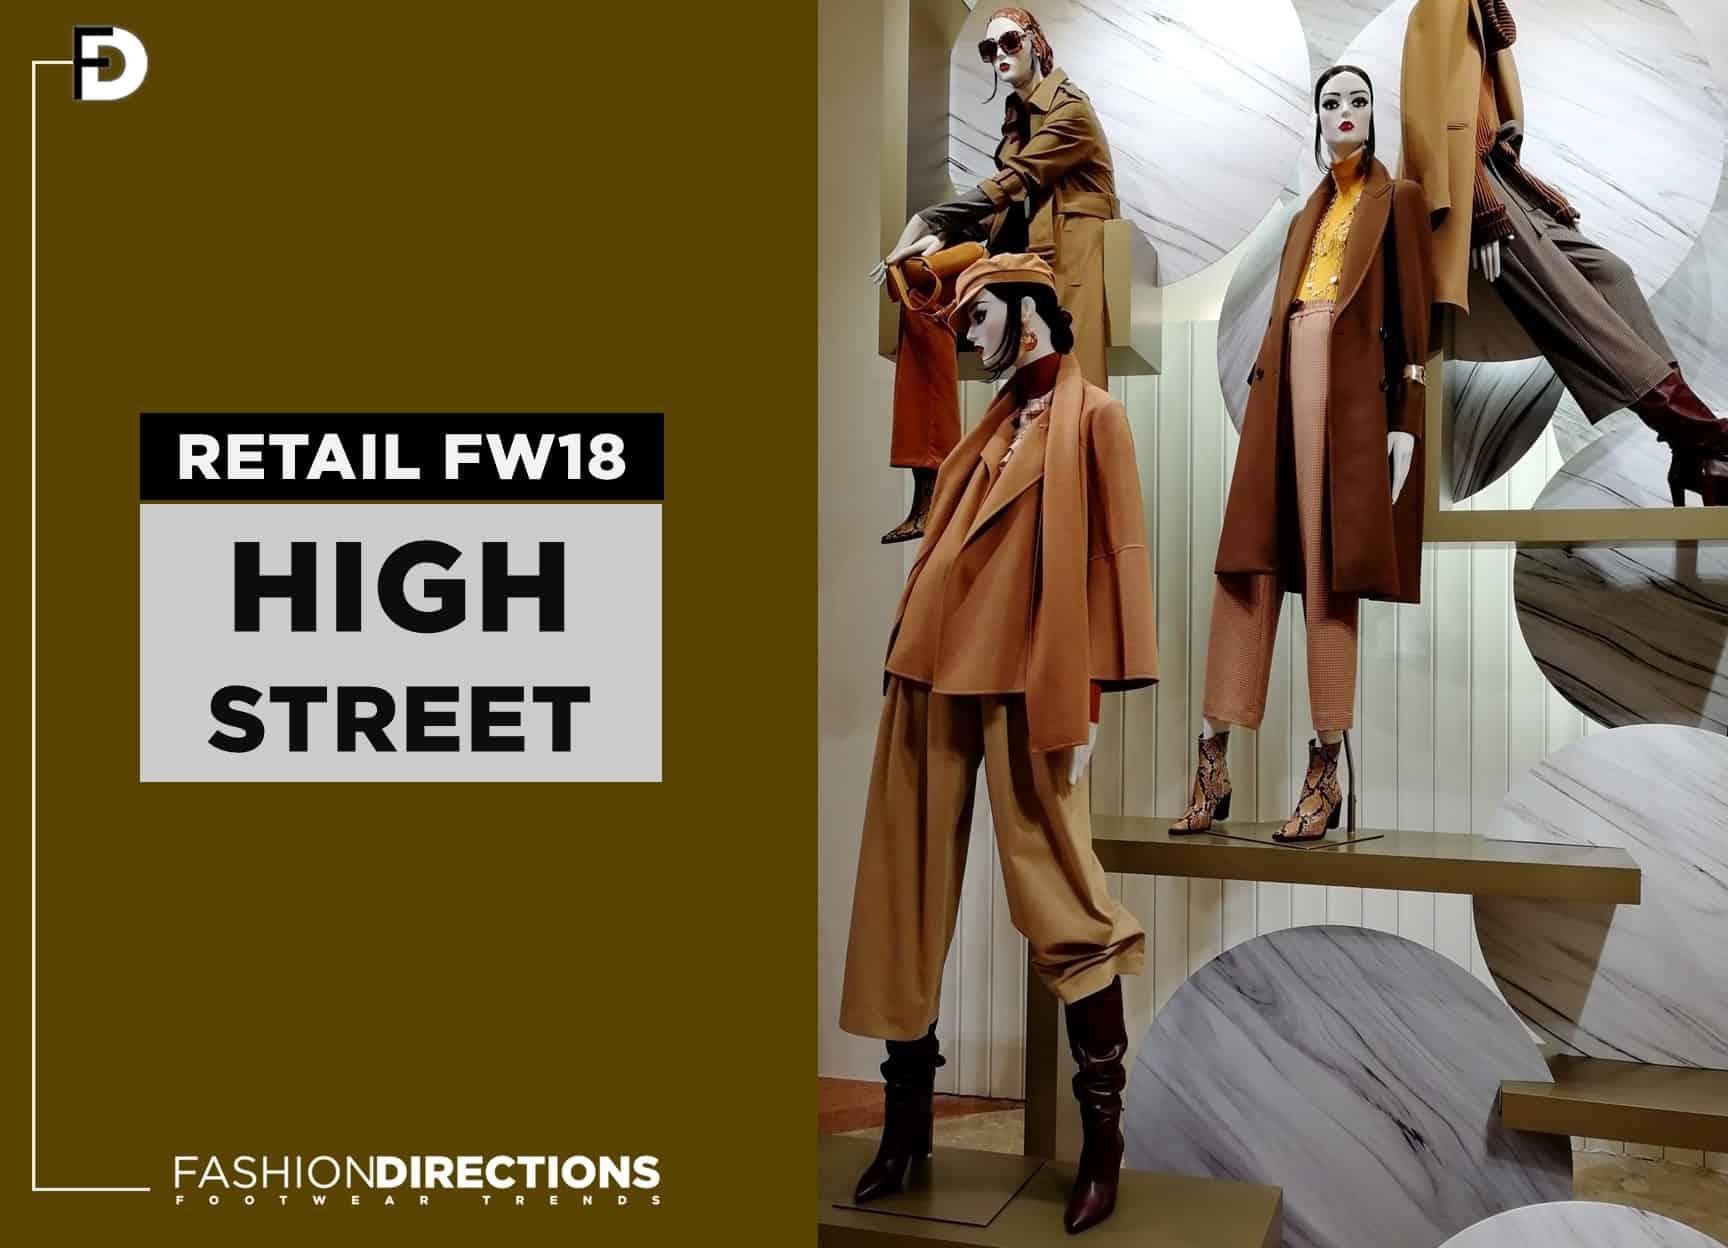 Retail High Street FW18